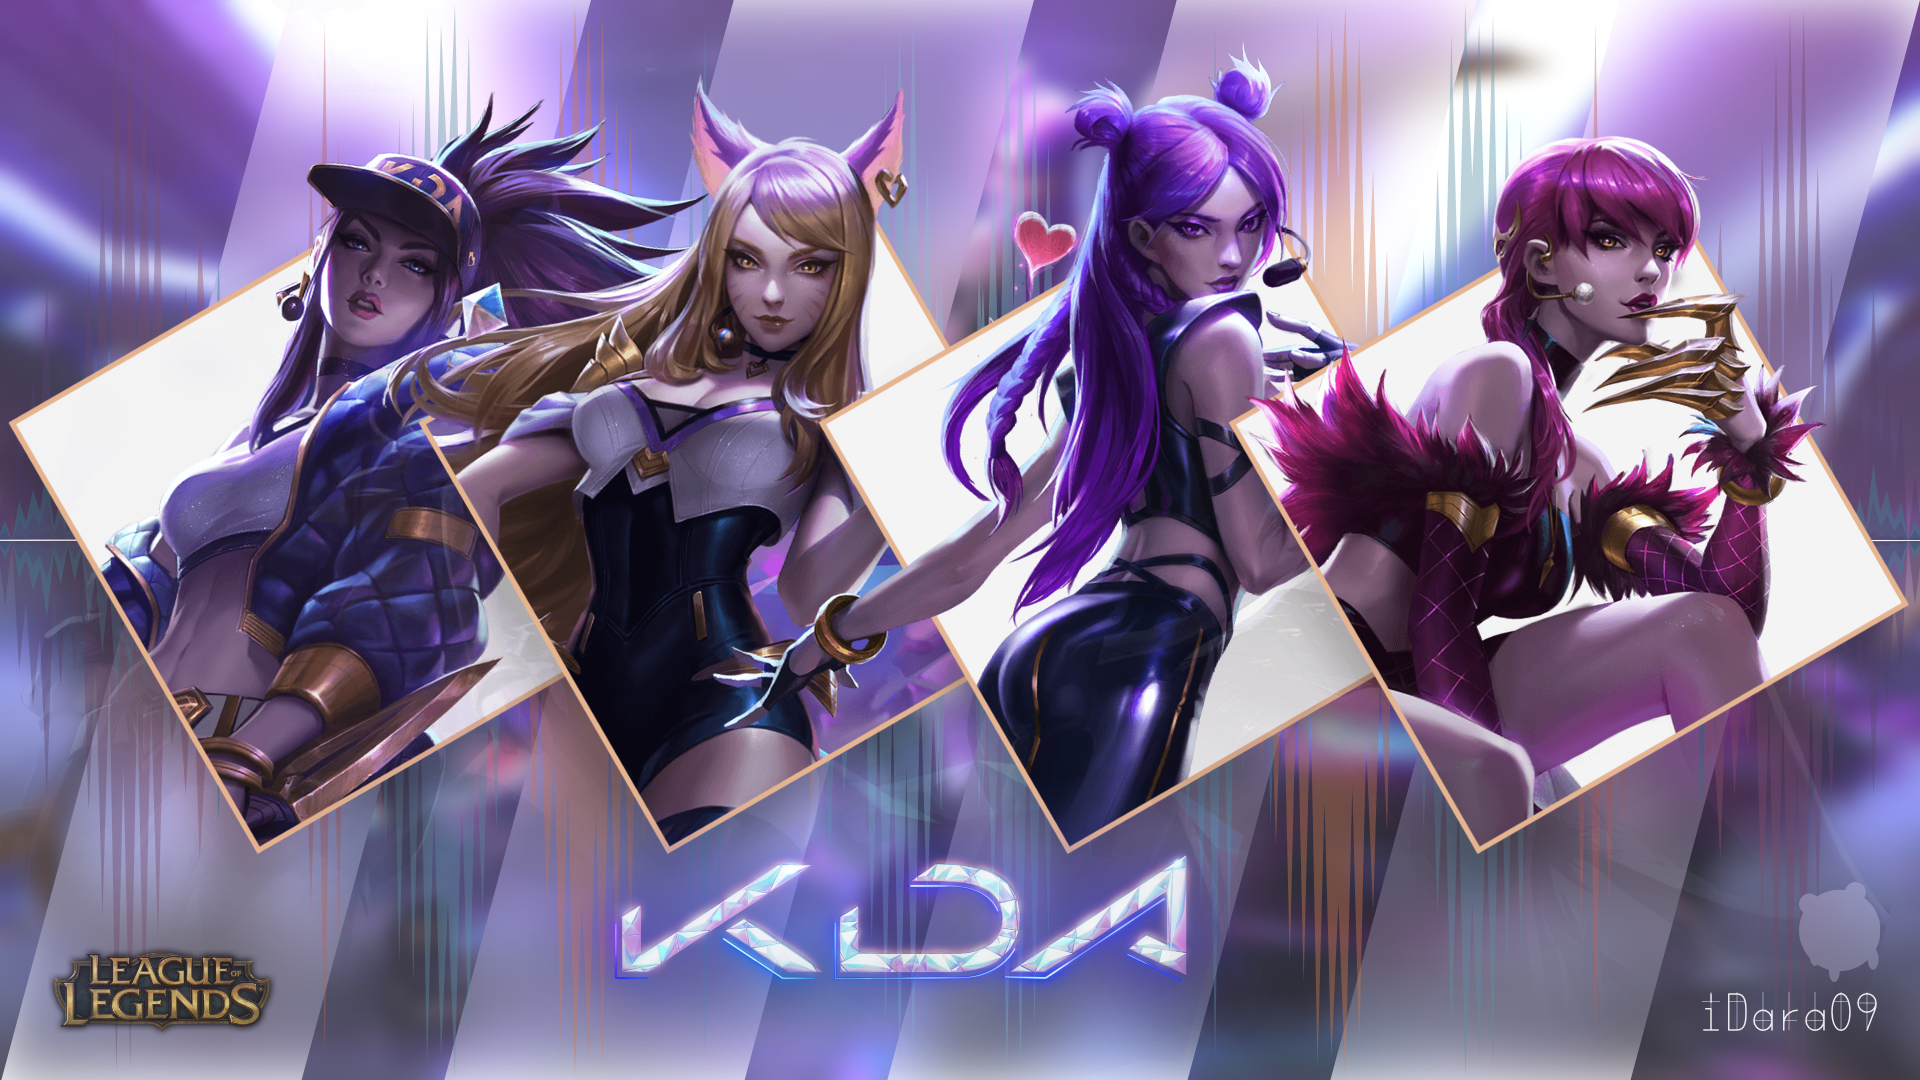 League Of Legends Kda Skins By Idara09 On Deviantart